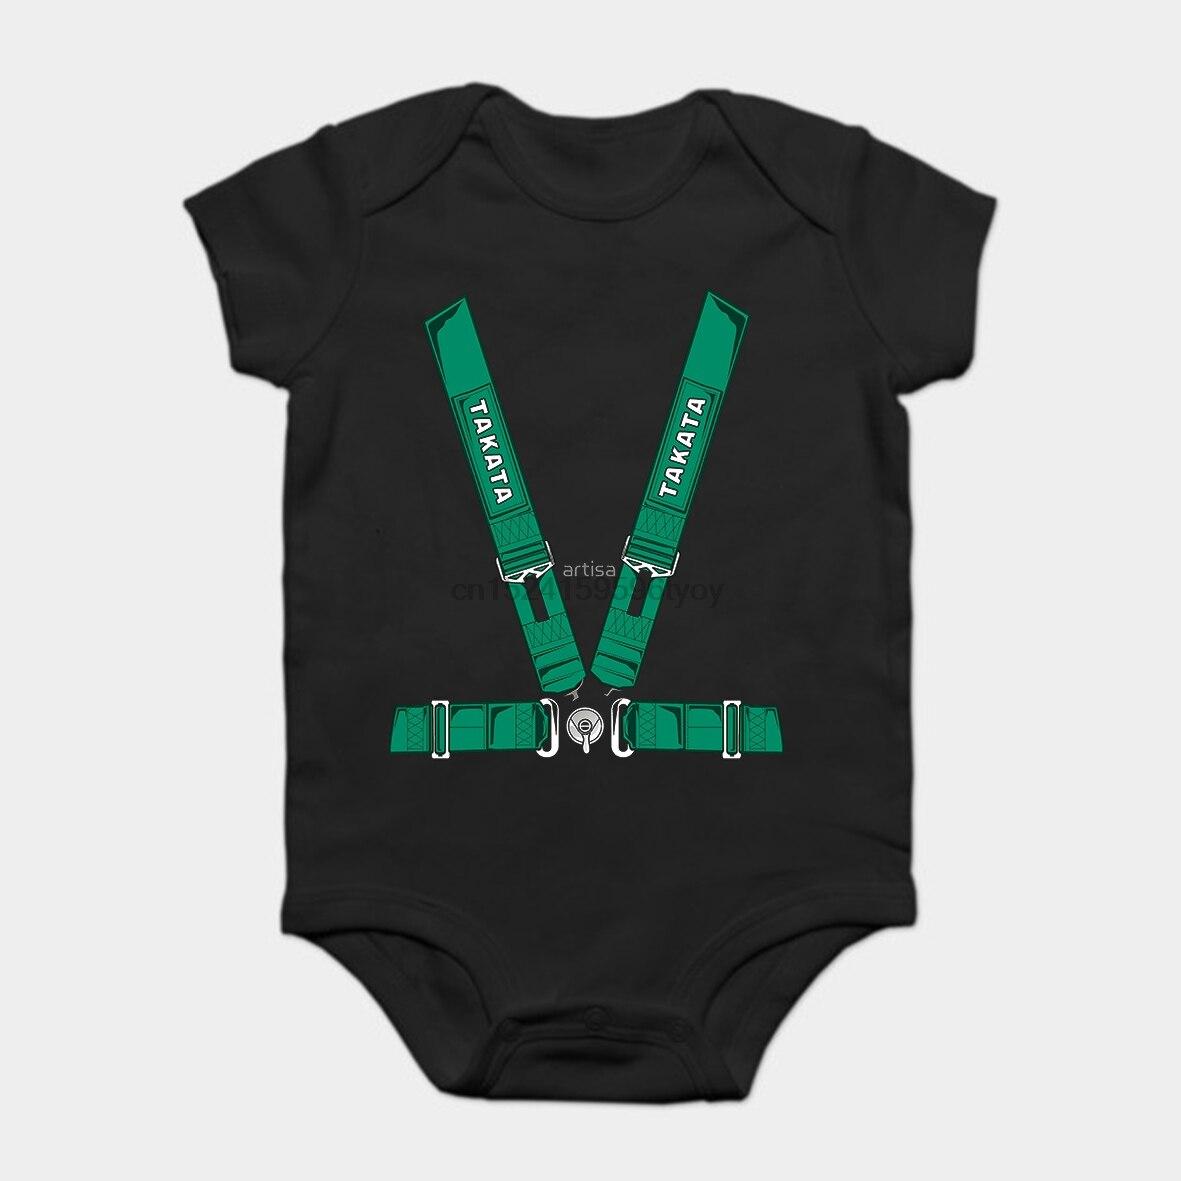 Baby Onesie Baby Bodysuits Kid T Shirt Printed Cotton Short-Sleeve TAKATA SEALTBELT